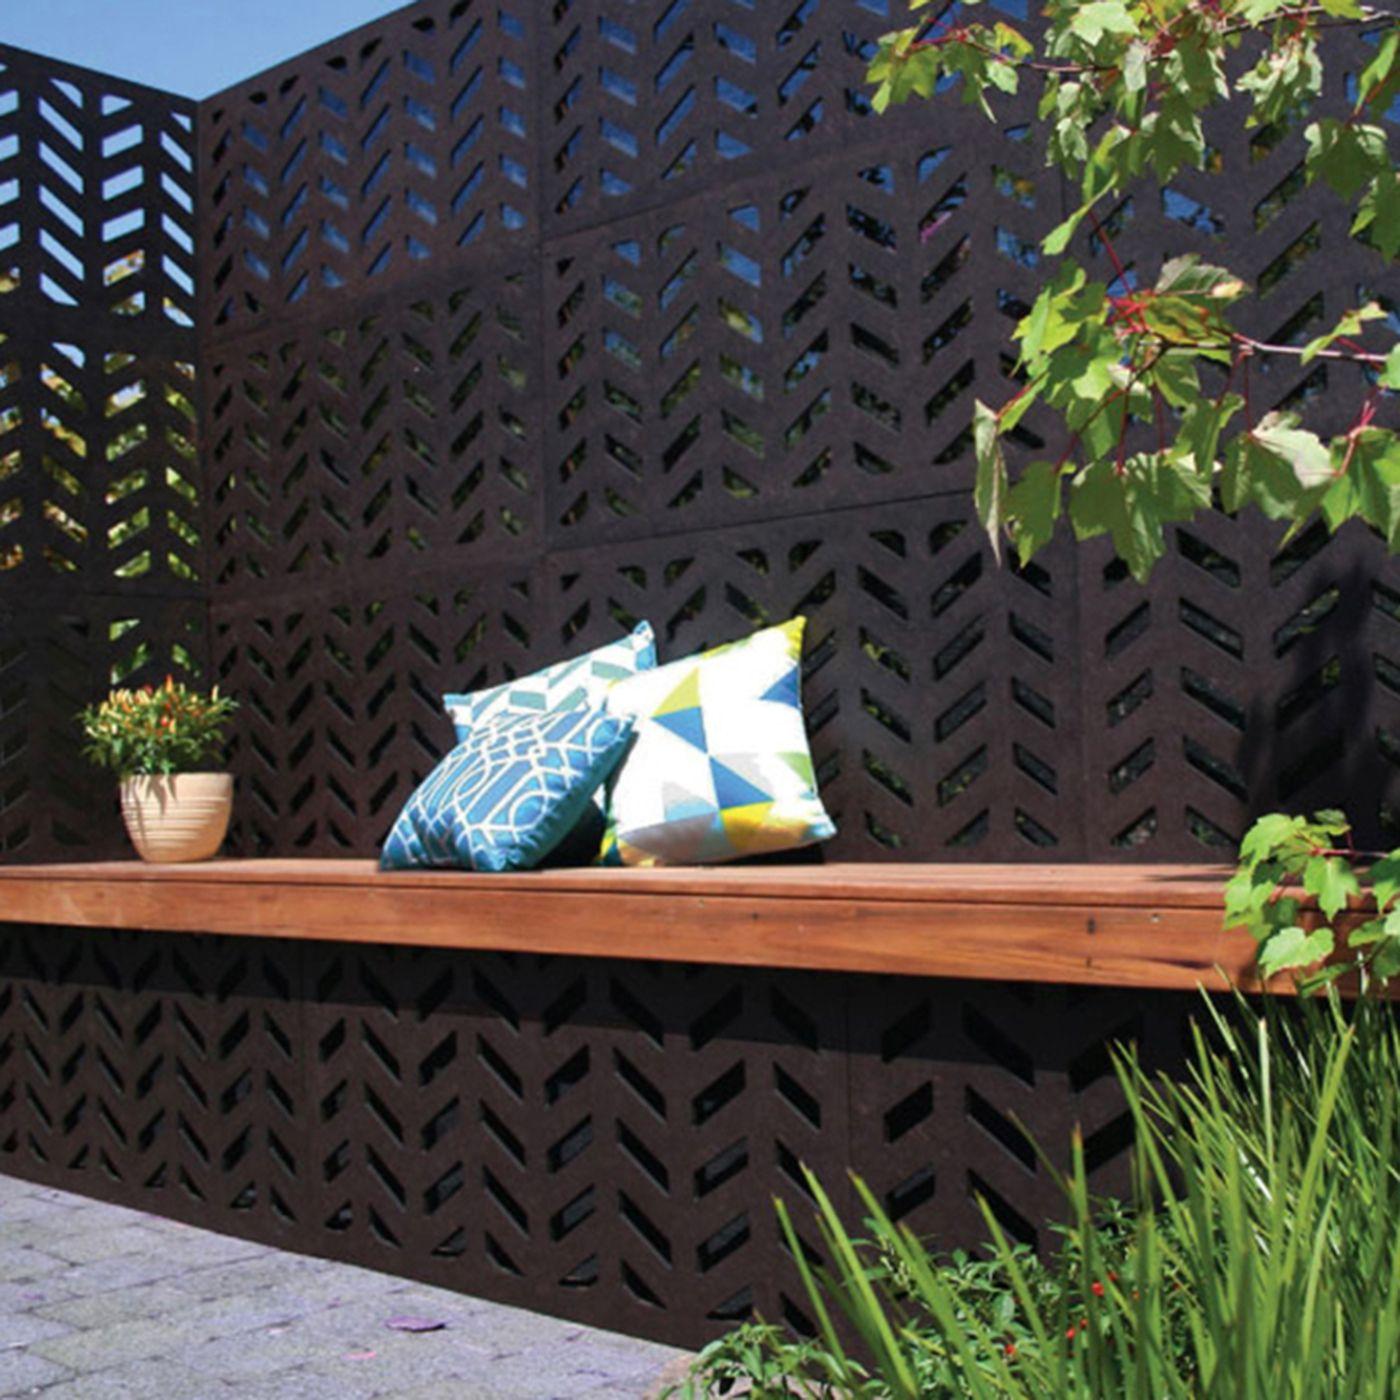 Herringbone Design 1200 Mm(H) X 600 Mm(W) Panels. 80